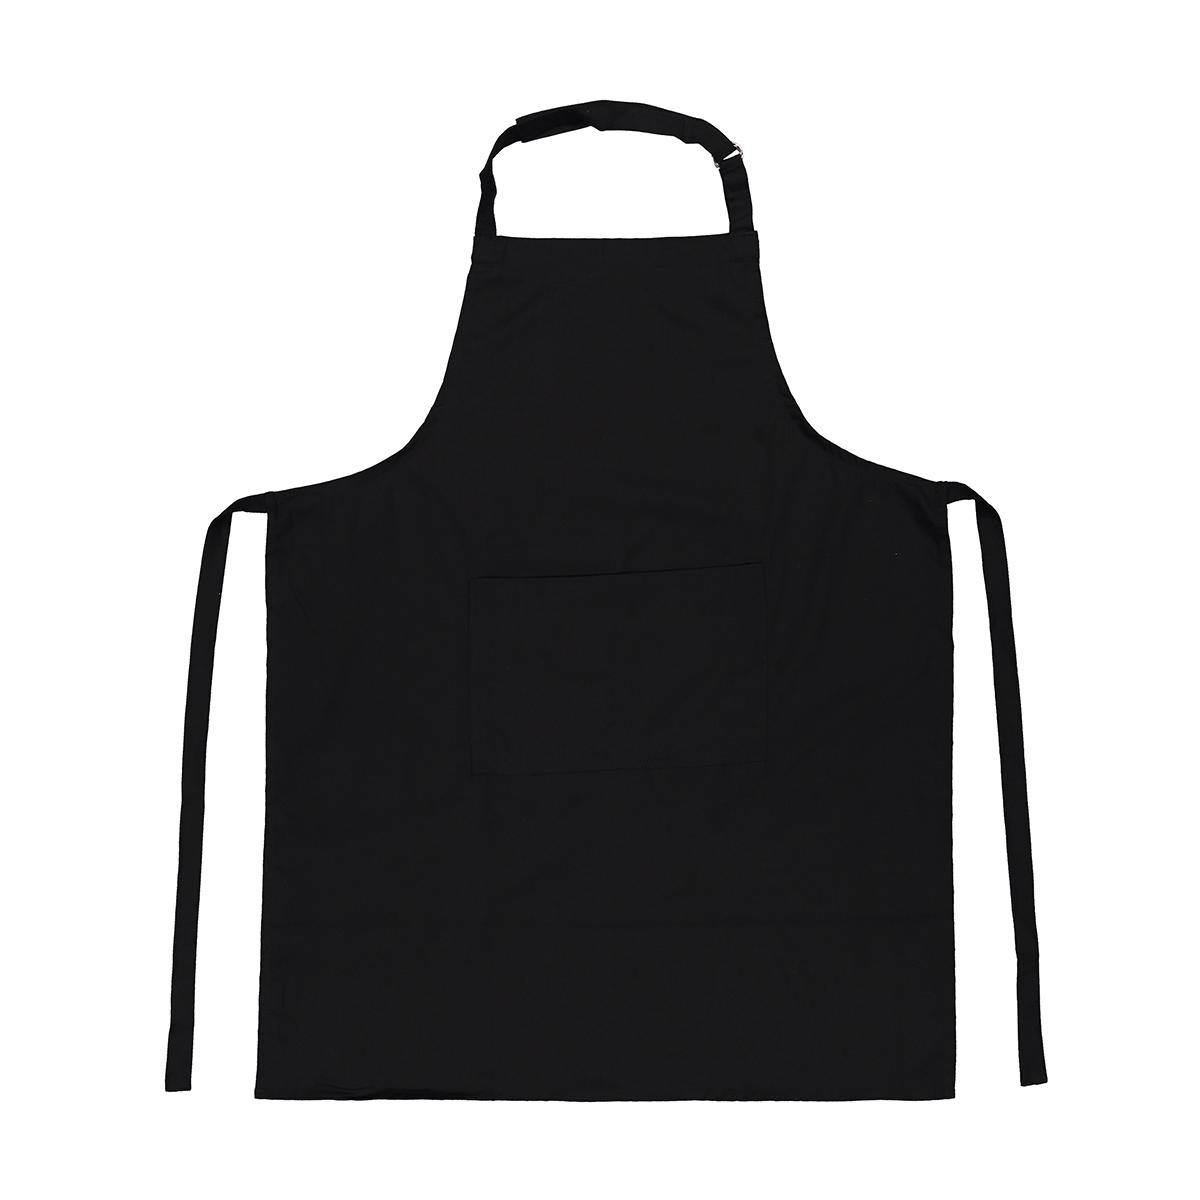 White apron melbourne - White Apron Melbourne 14